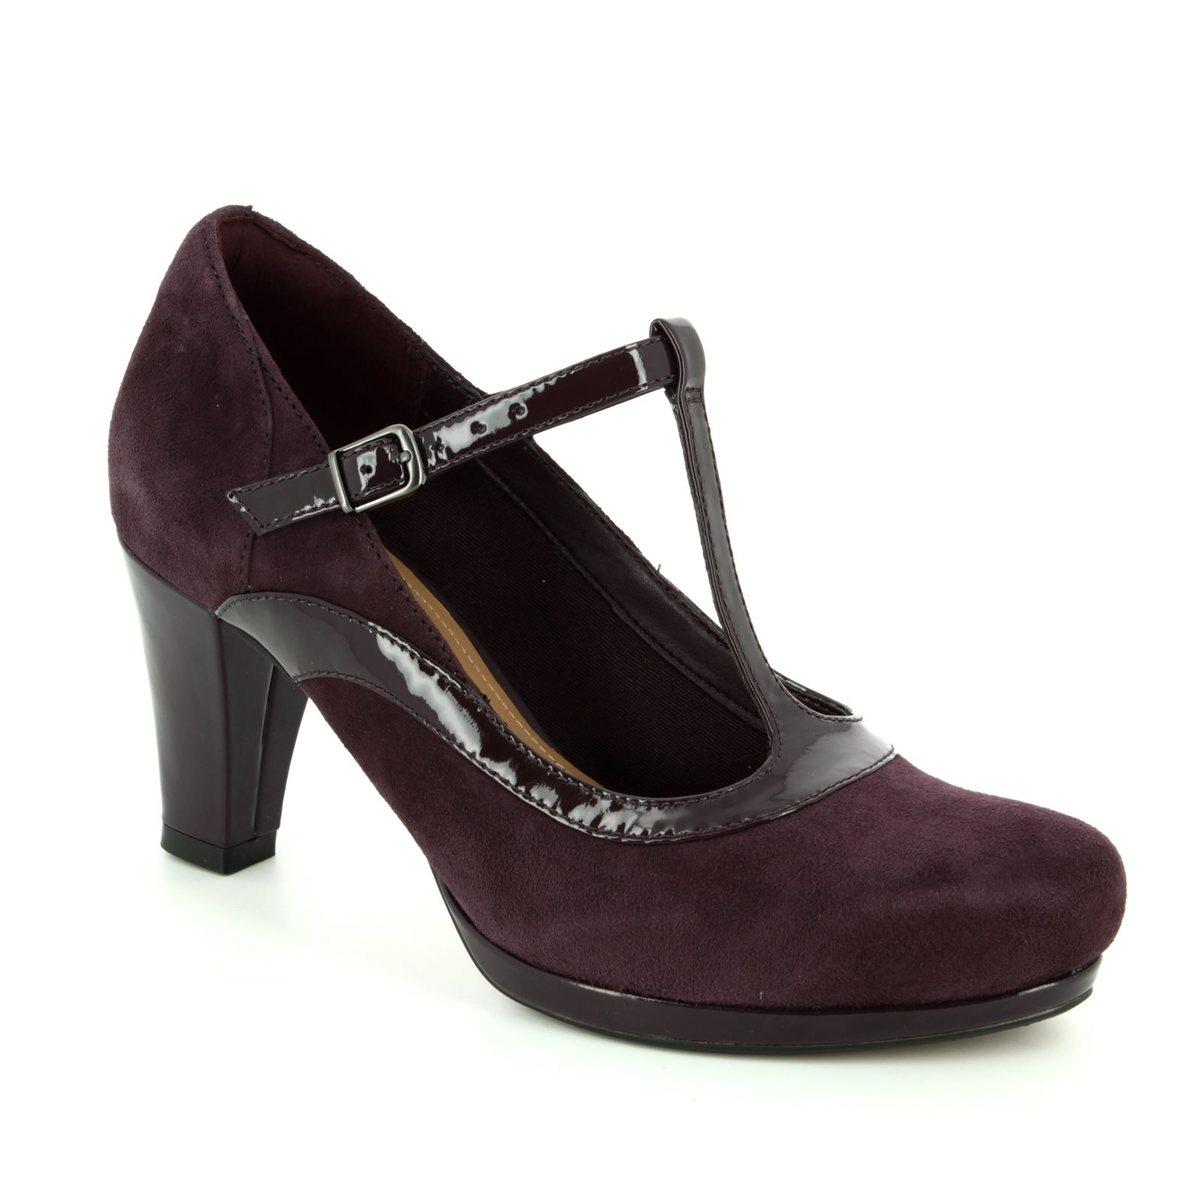 fb98417c7c92a Clarks High-heeled Shoes - Aubergine - 2882/14D CHORUS PITCH